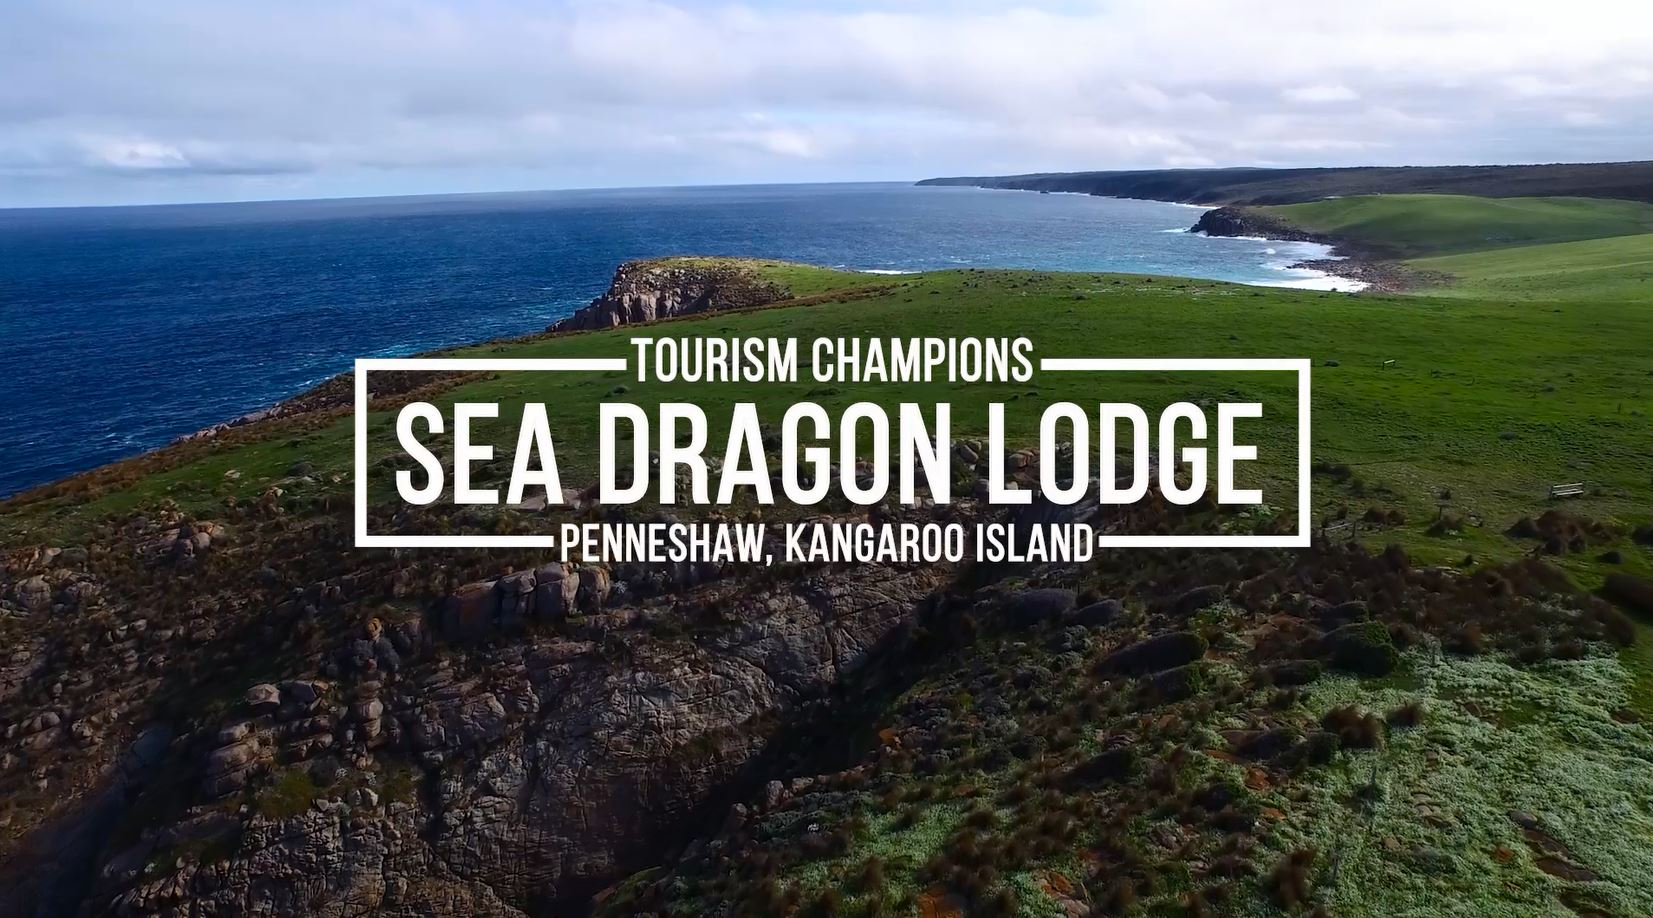 Introducing Tourism Champion - Sea Dragon Lodge - Watch their story here: https://t.co/vxLMK4zY9k @TourismAus https://t.co/l9NxP5xoD5